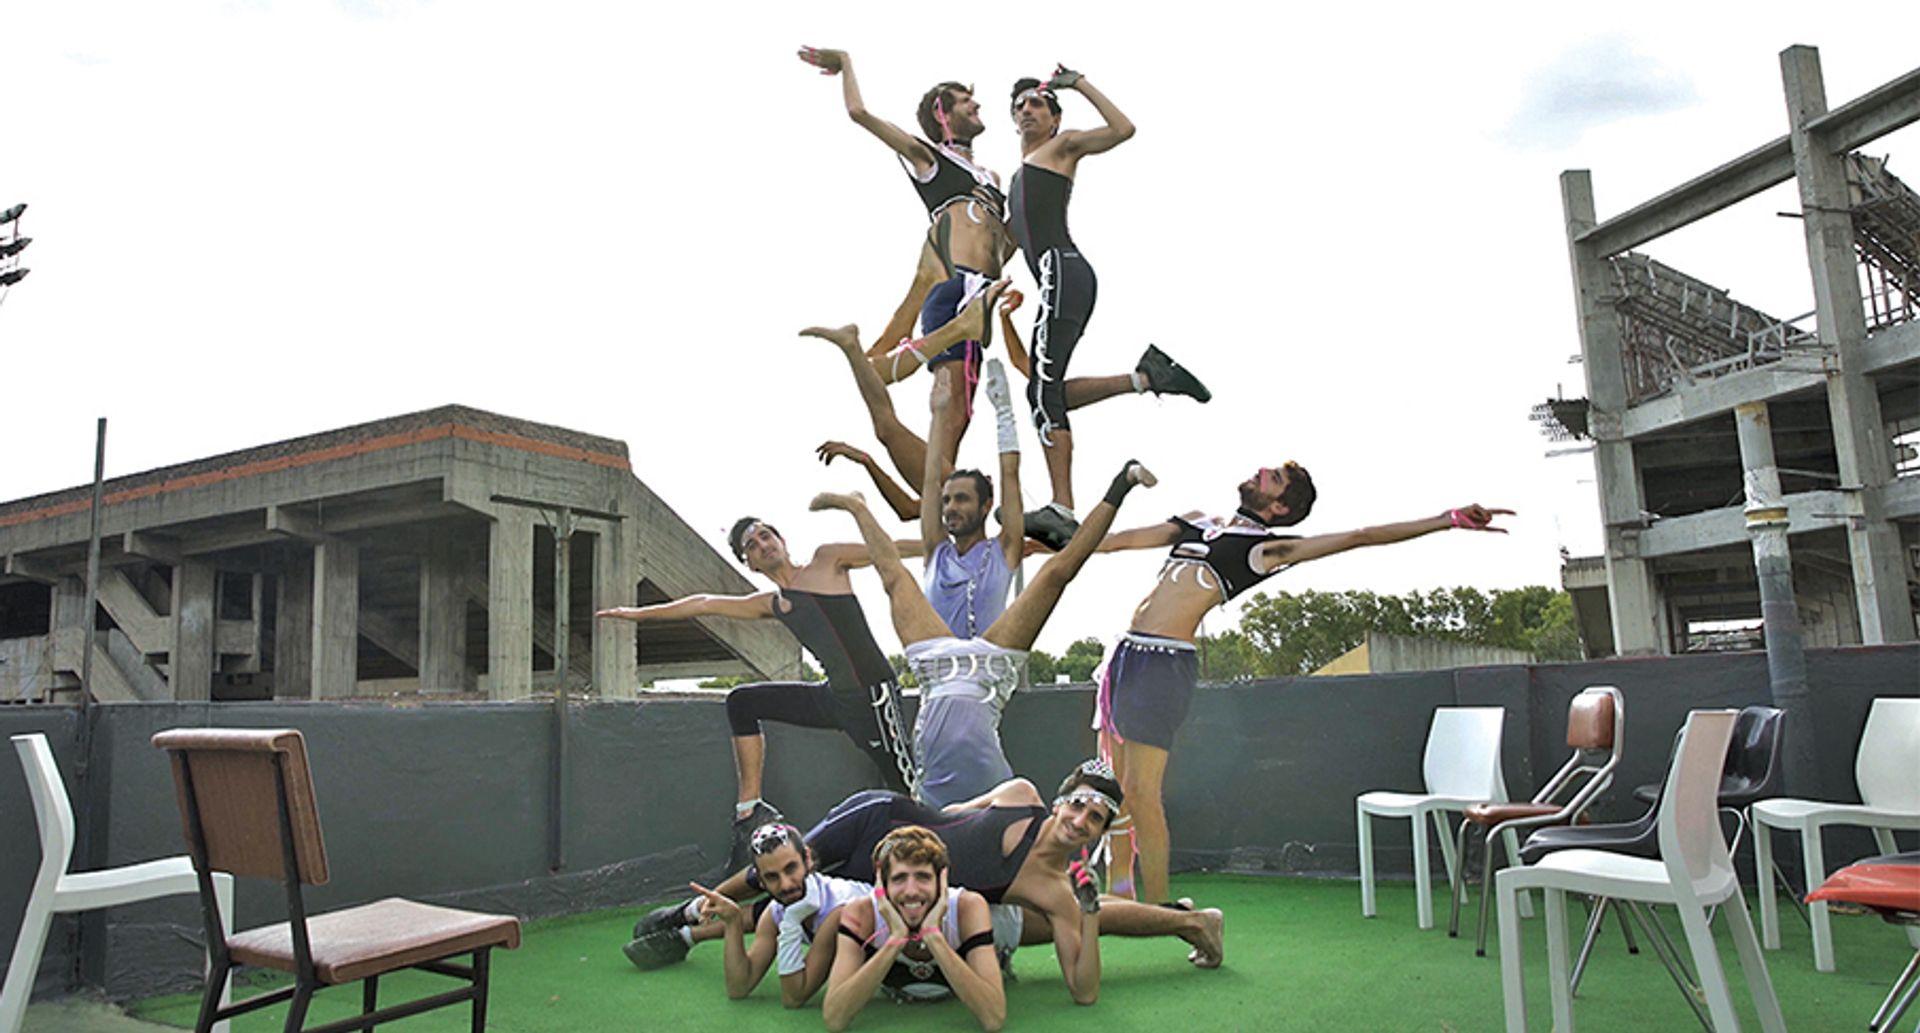 The Argentinian artist collective Básica TV features in a video at Nada Miami ©Un Estudios